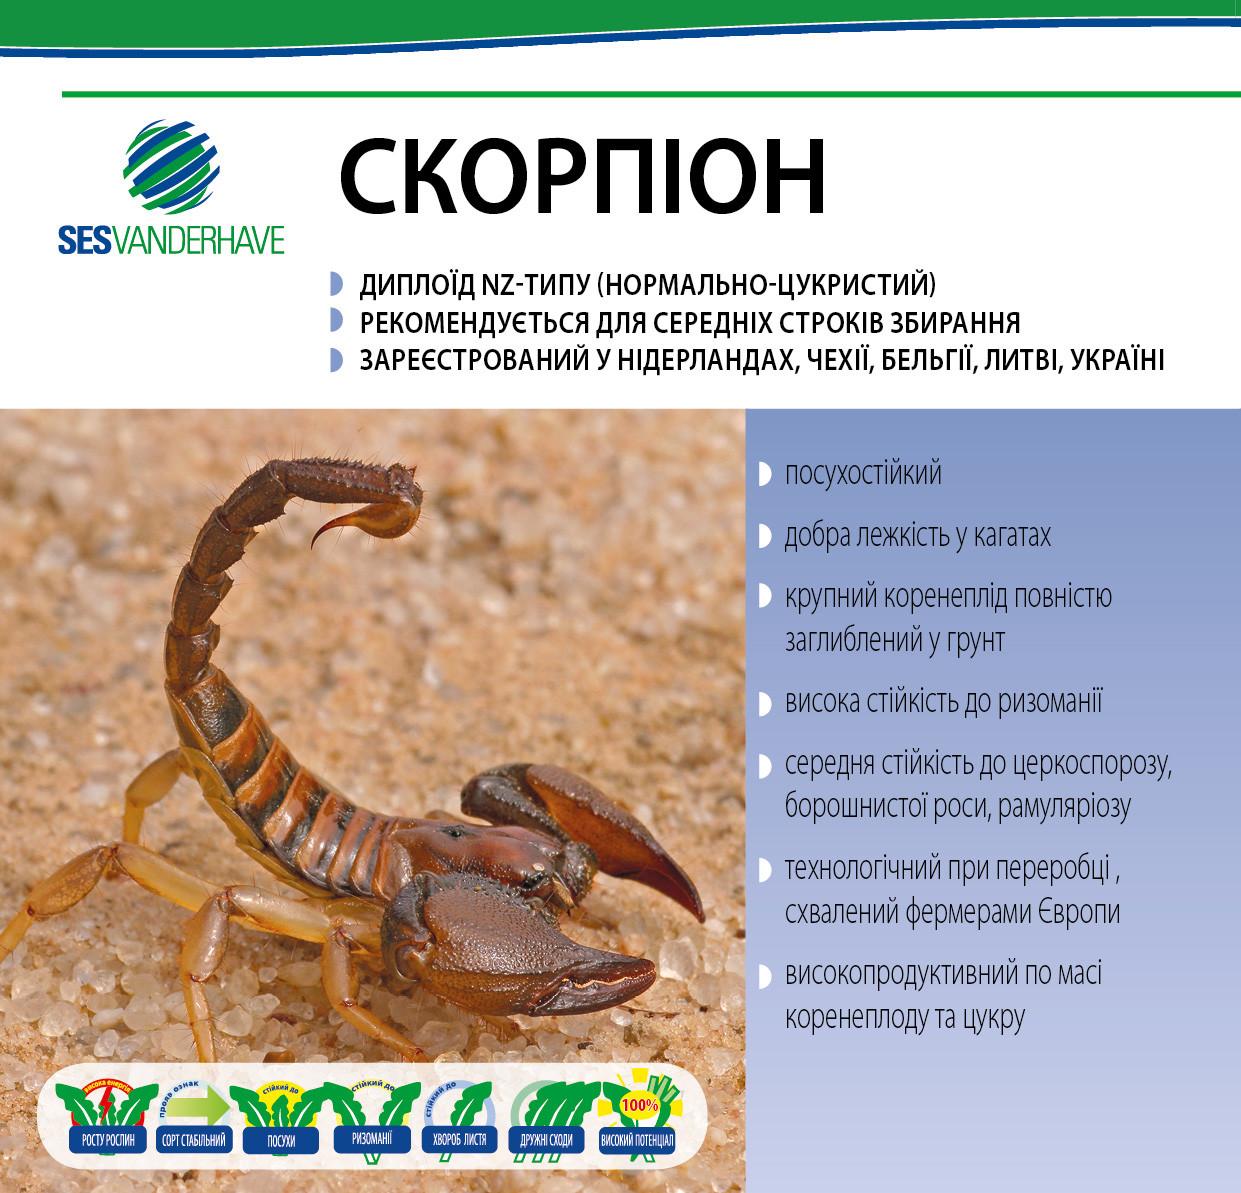 Скорпион семена сахарной свеклы / насіння цукрового буряка Скорпіон SESVanderHave стандарт